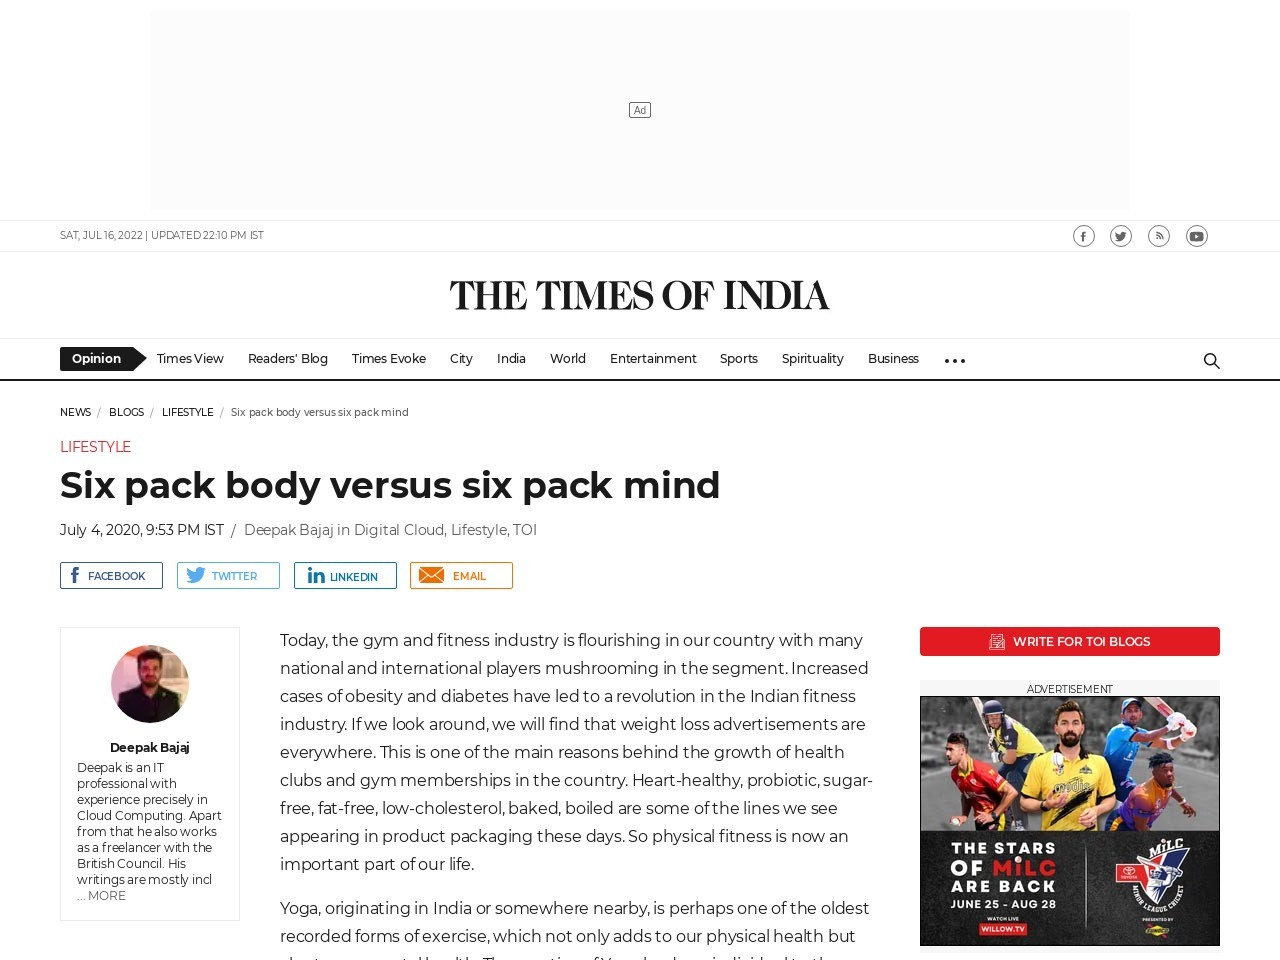 Six pack body versus six pack mind